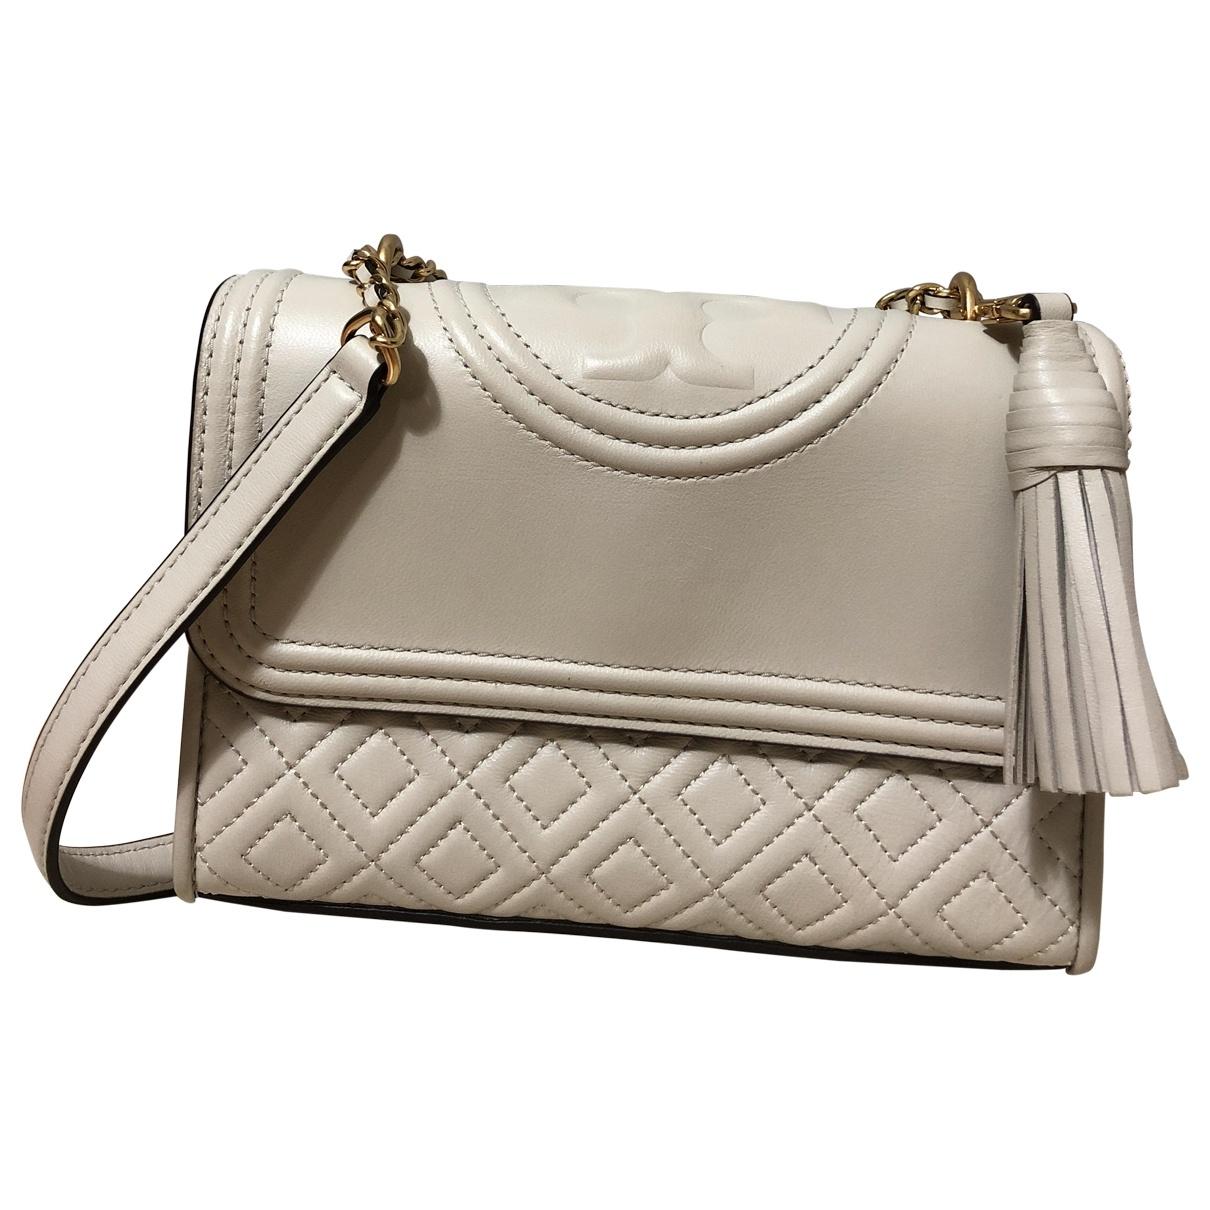 Tory Burch \N White Leather handbag for Women \N